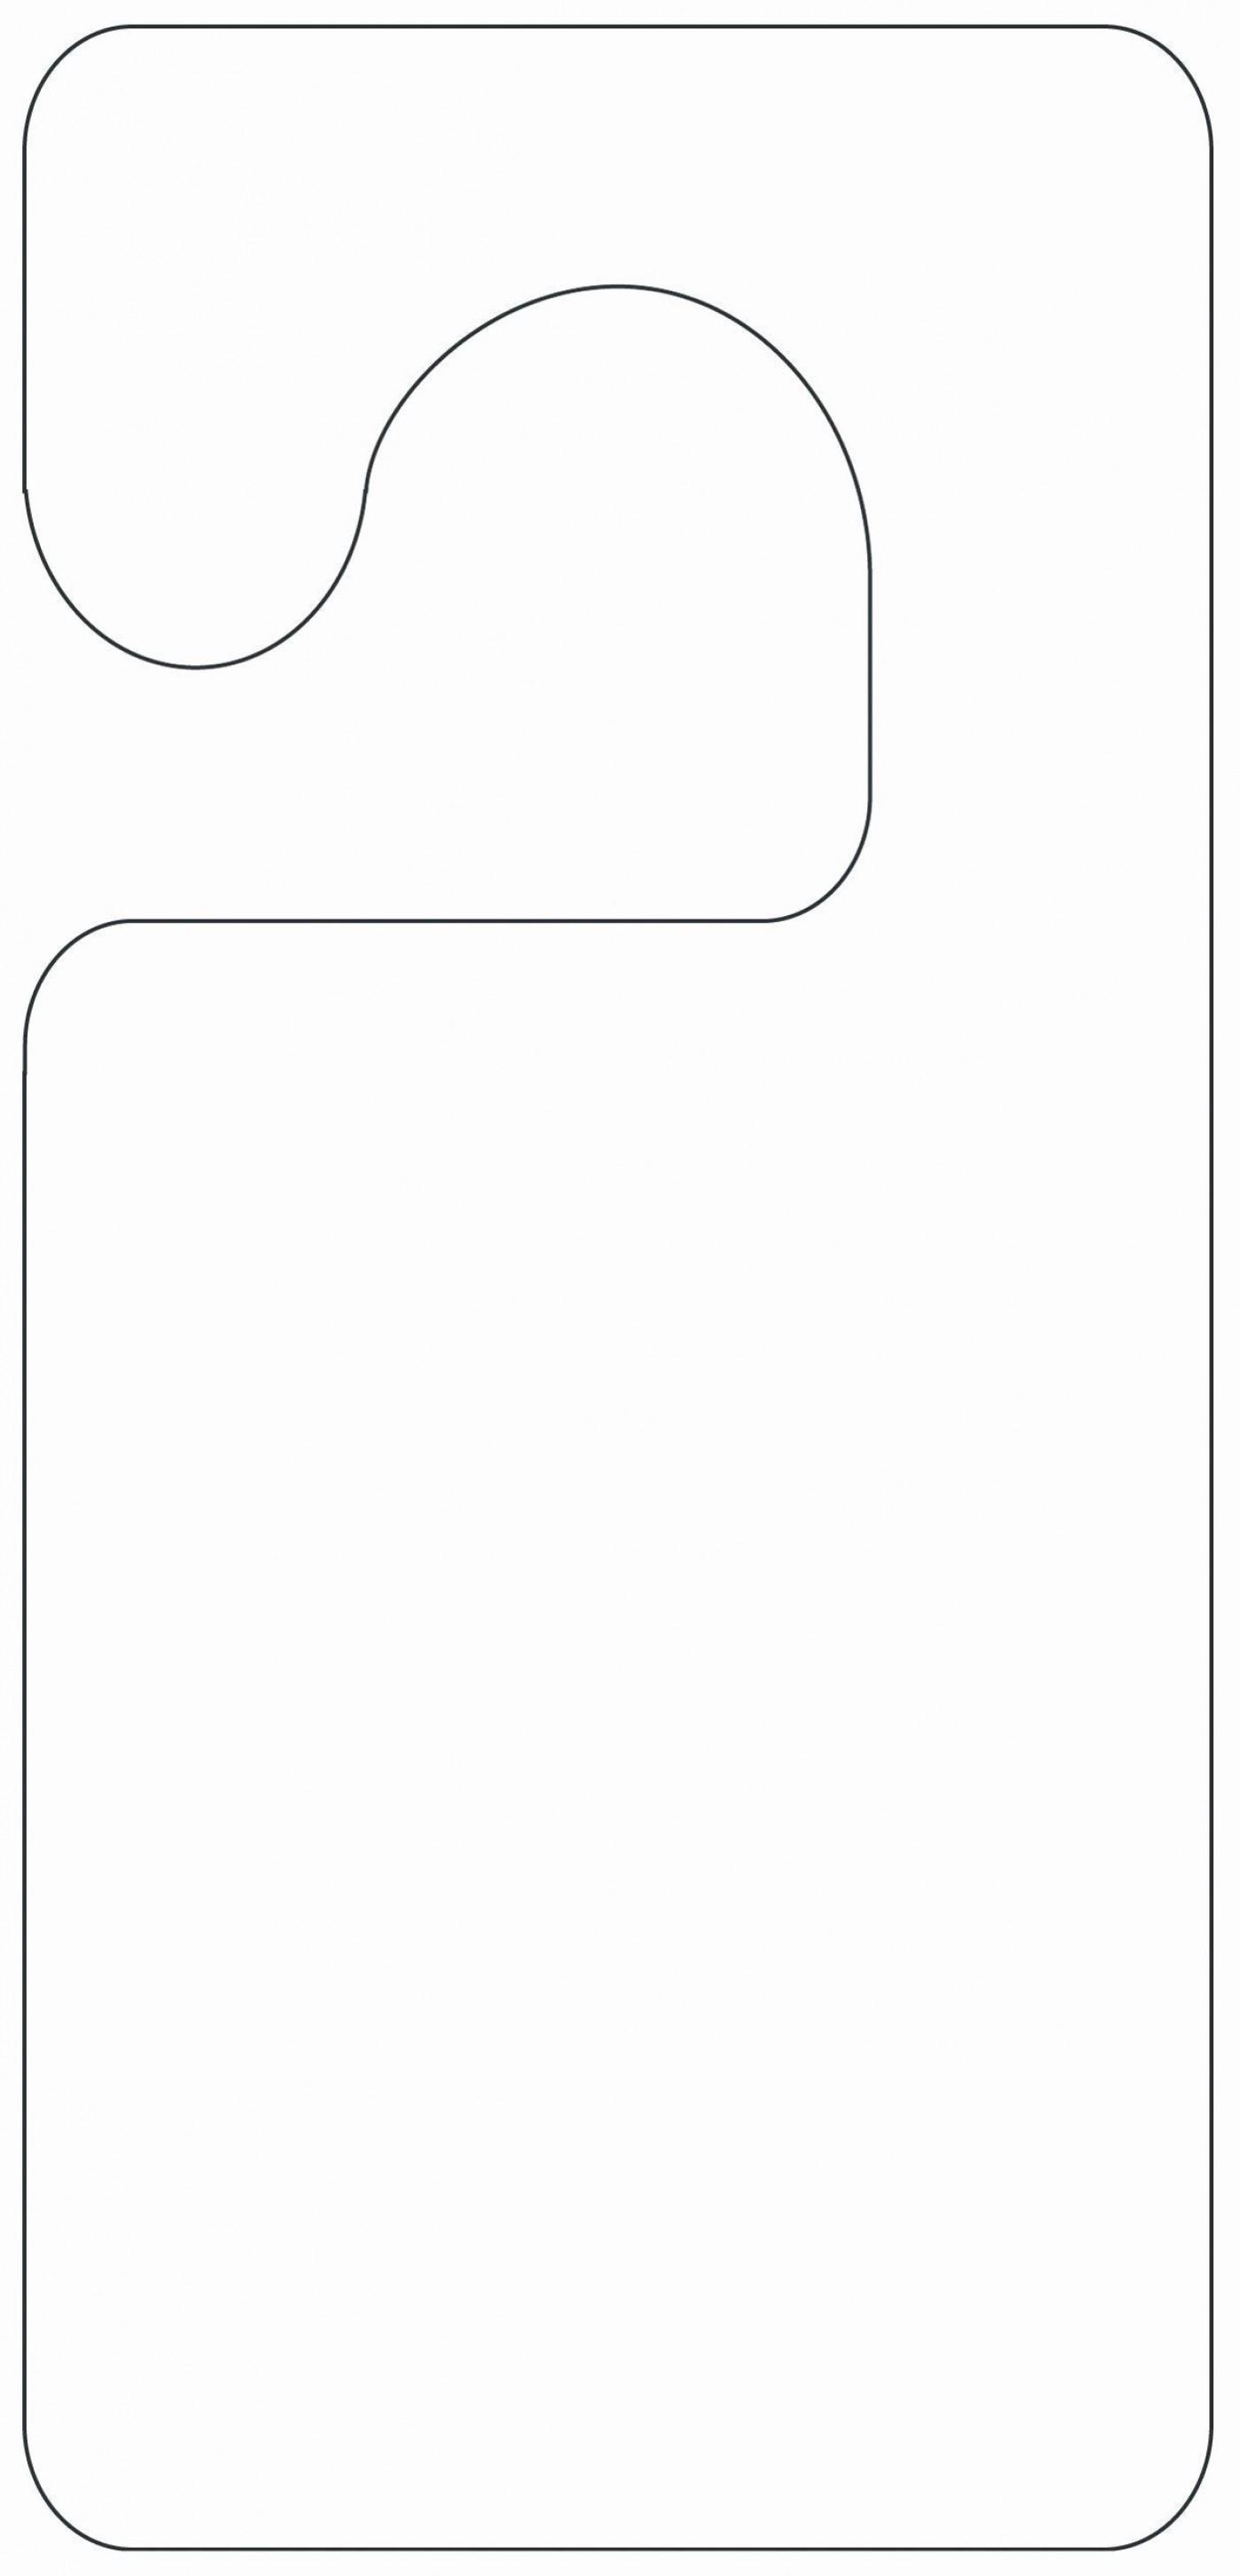 002 Wondrou Free Printable Template For Door Hanger Sample 1400